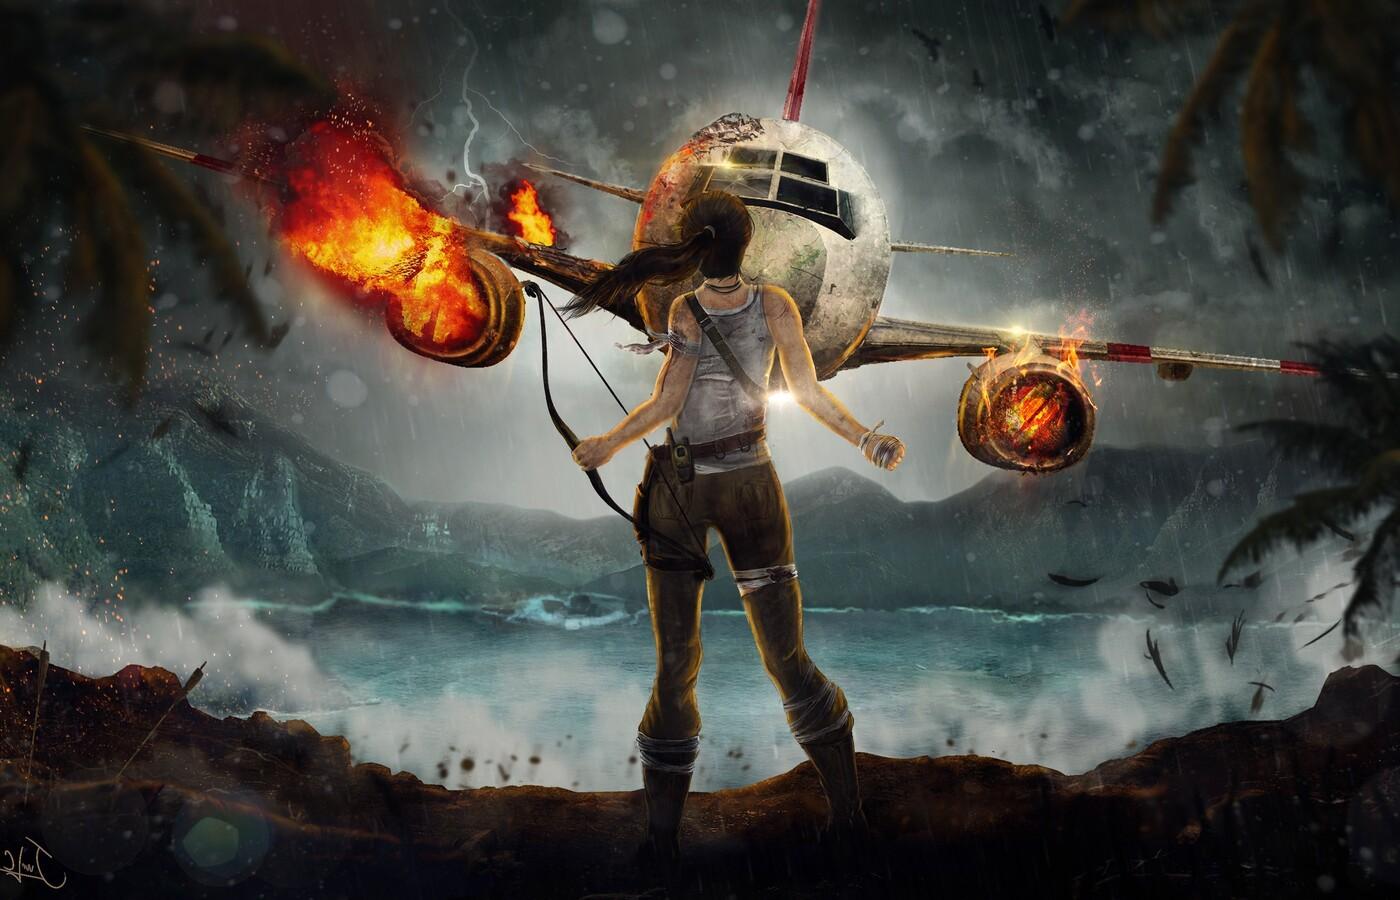 lara-croft-adventure.jpg